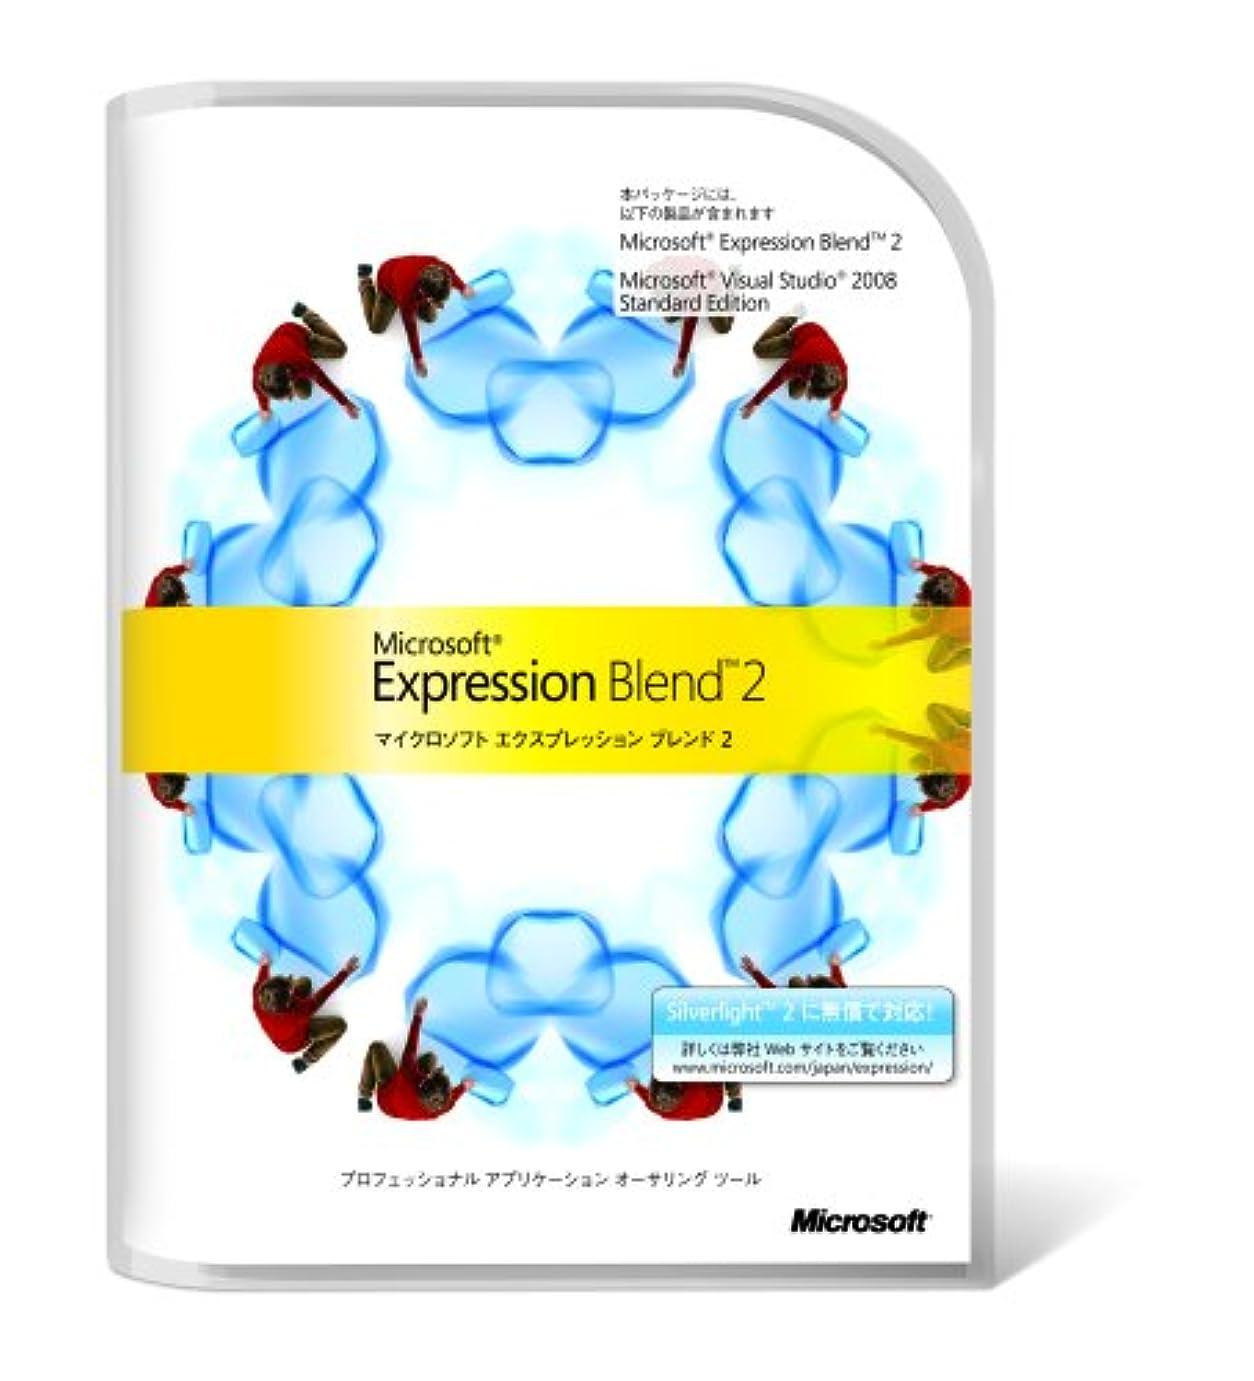 失態違法抽選Microsoft Expression Blend 2